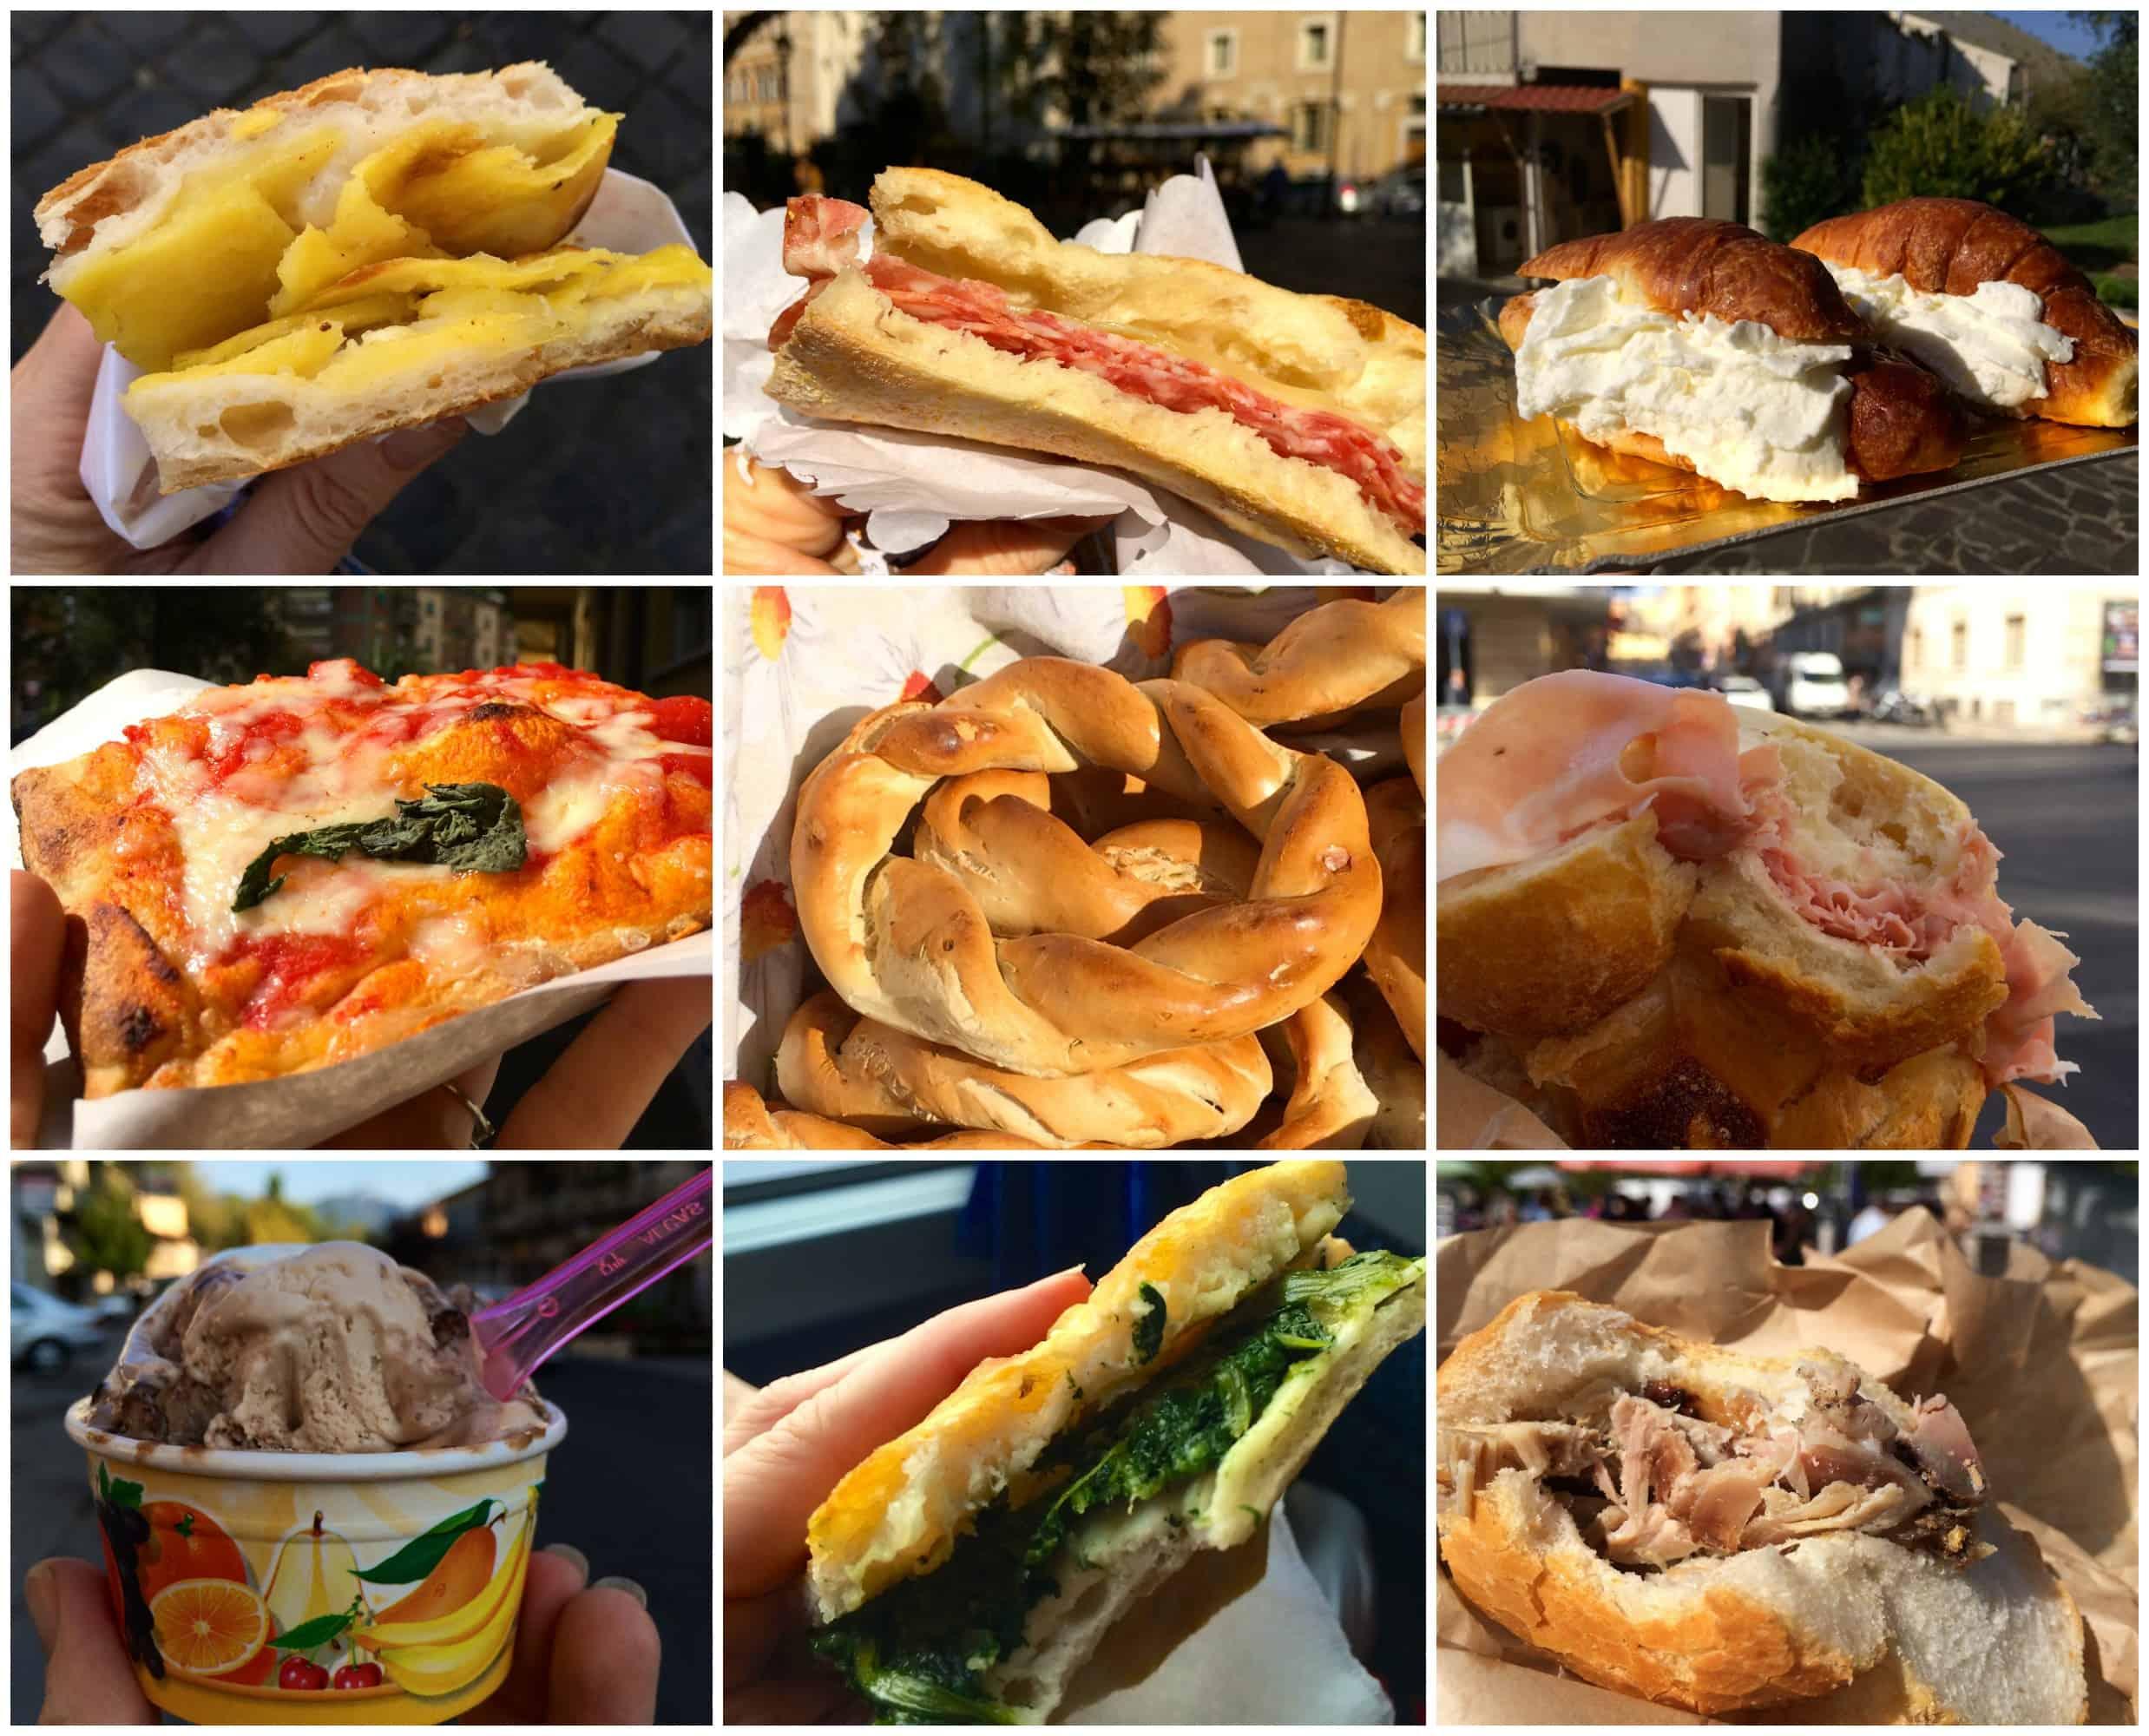 Top nine handheld snacks not to miss in italy christina for Italian snacks